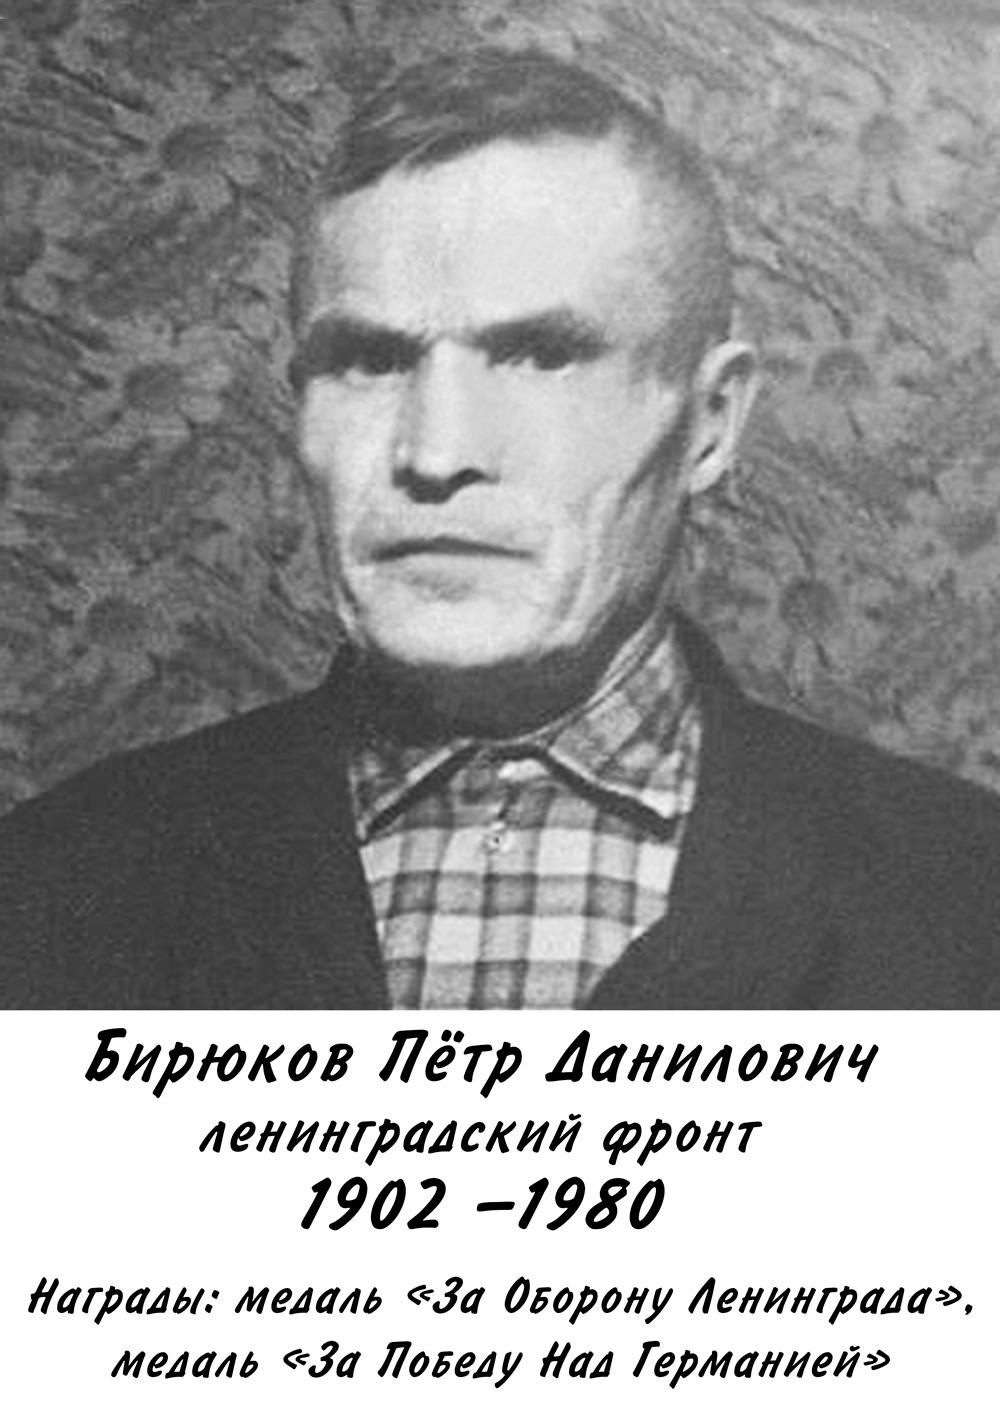 Бирюков Пётр Данилович